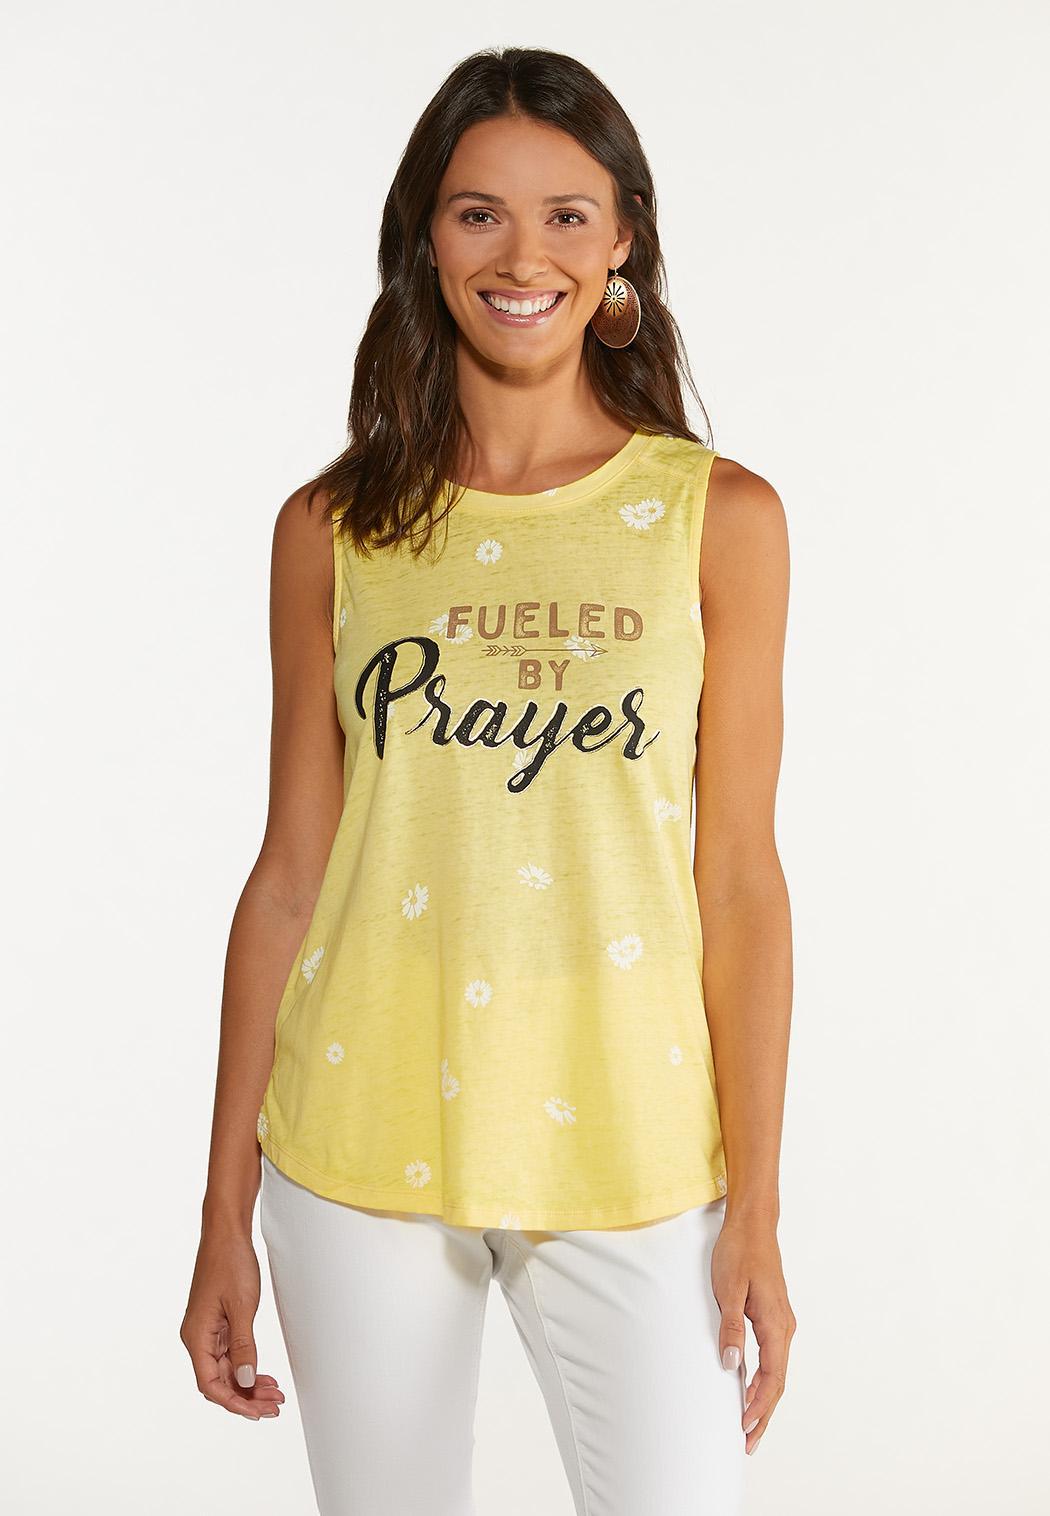 Fueled By Prayer Tank